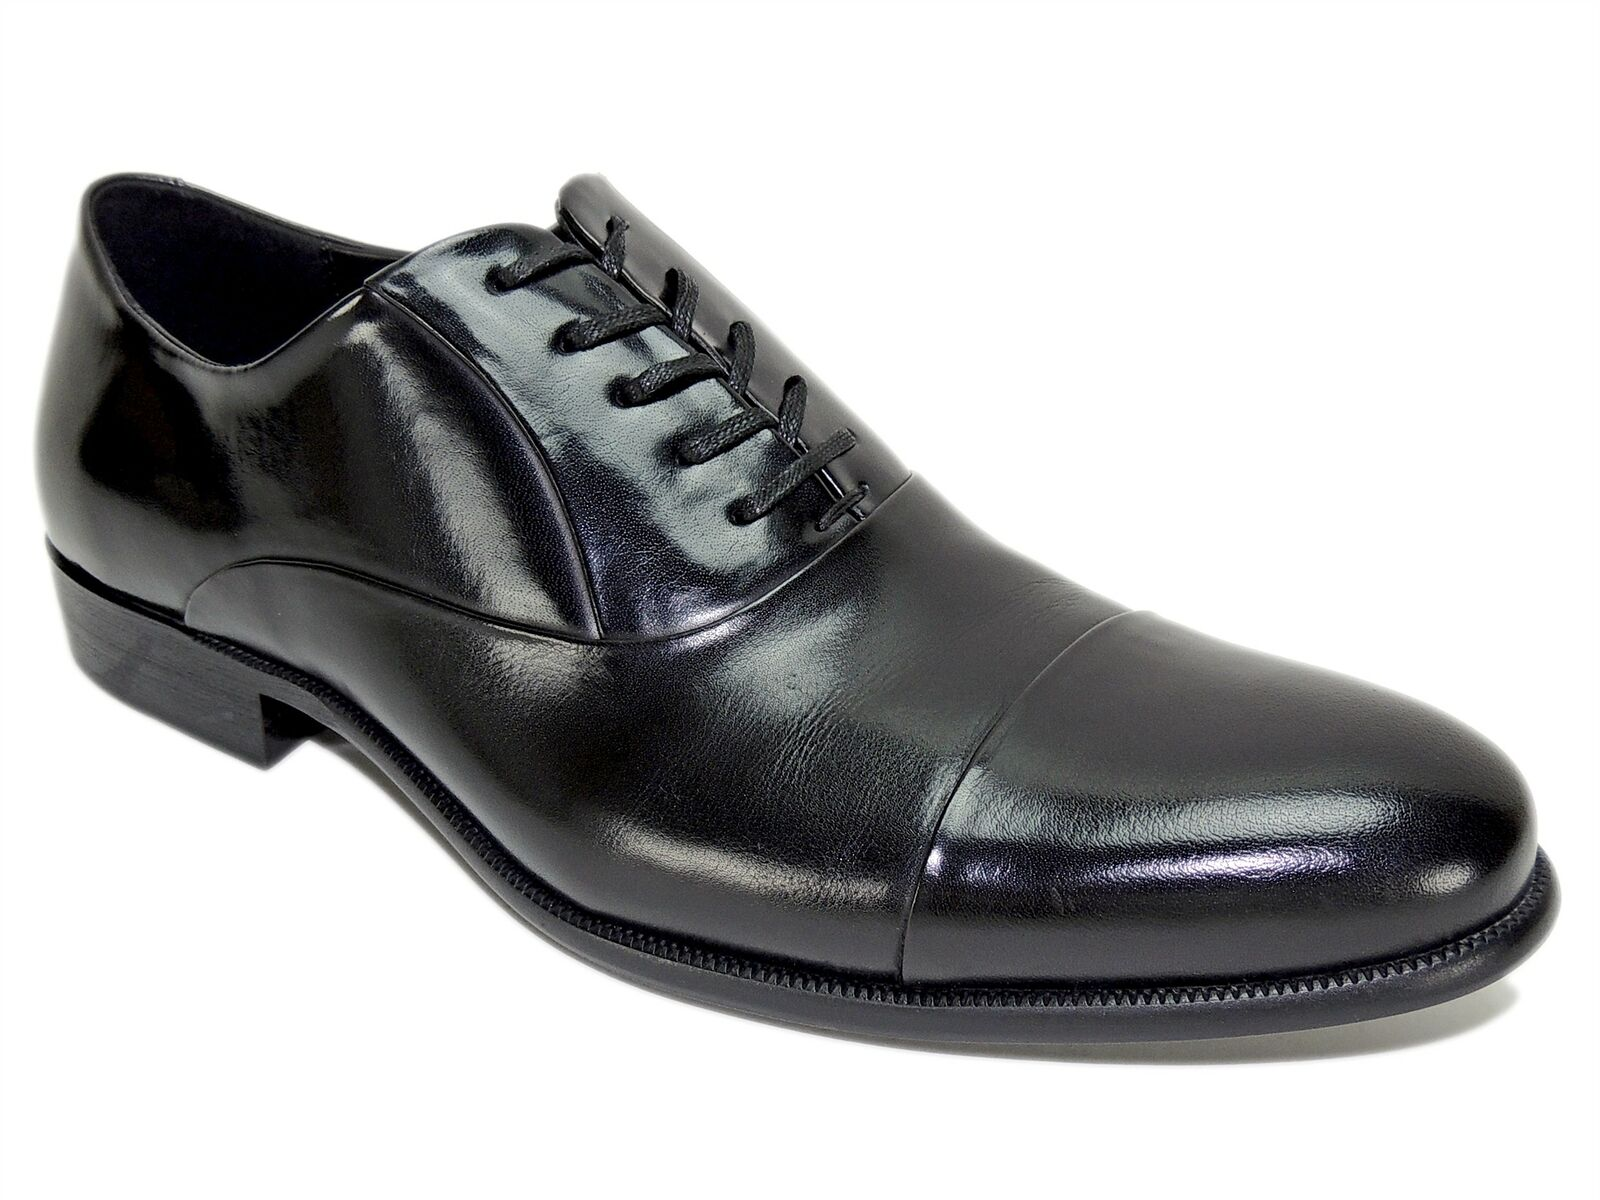 Kenneth Cole New York Men's Chief Council Cap Toe Oxfords Black Size 7.5 M